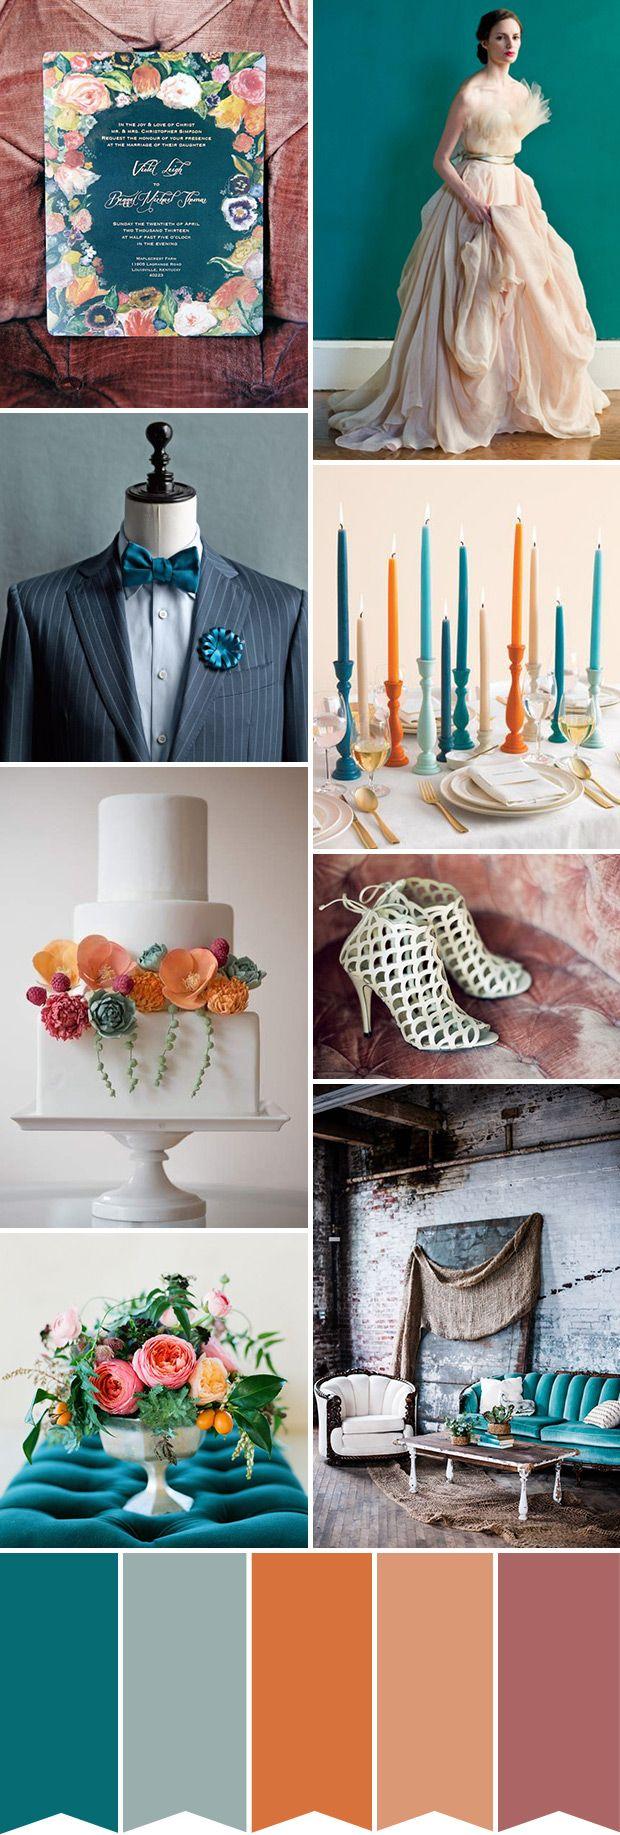 Teal + Orange An Autumnal Colour Palette Fall wedding